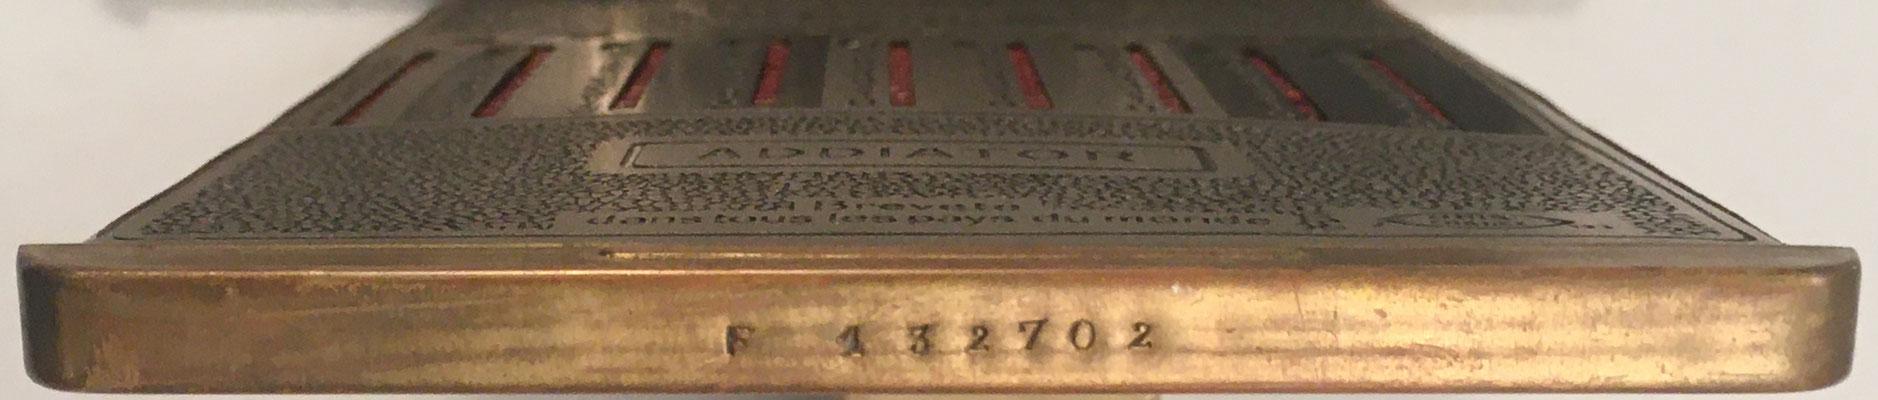 Ábaco de ranuras ADDIATOR, detalle de su s/n F-132702